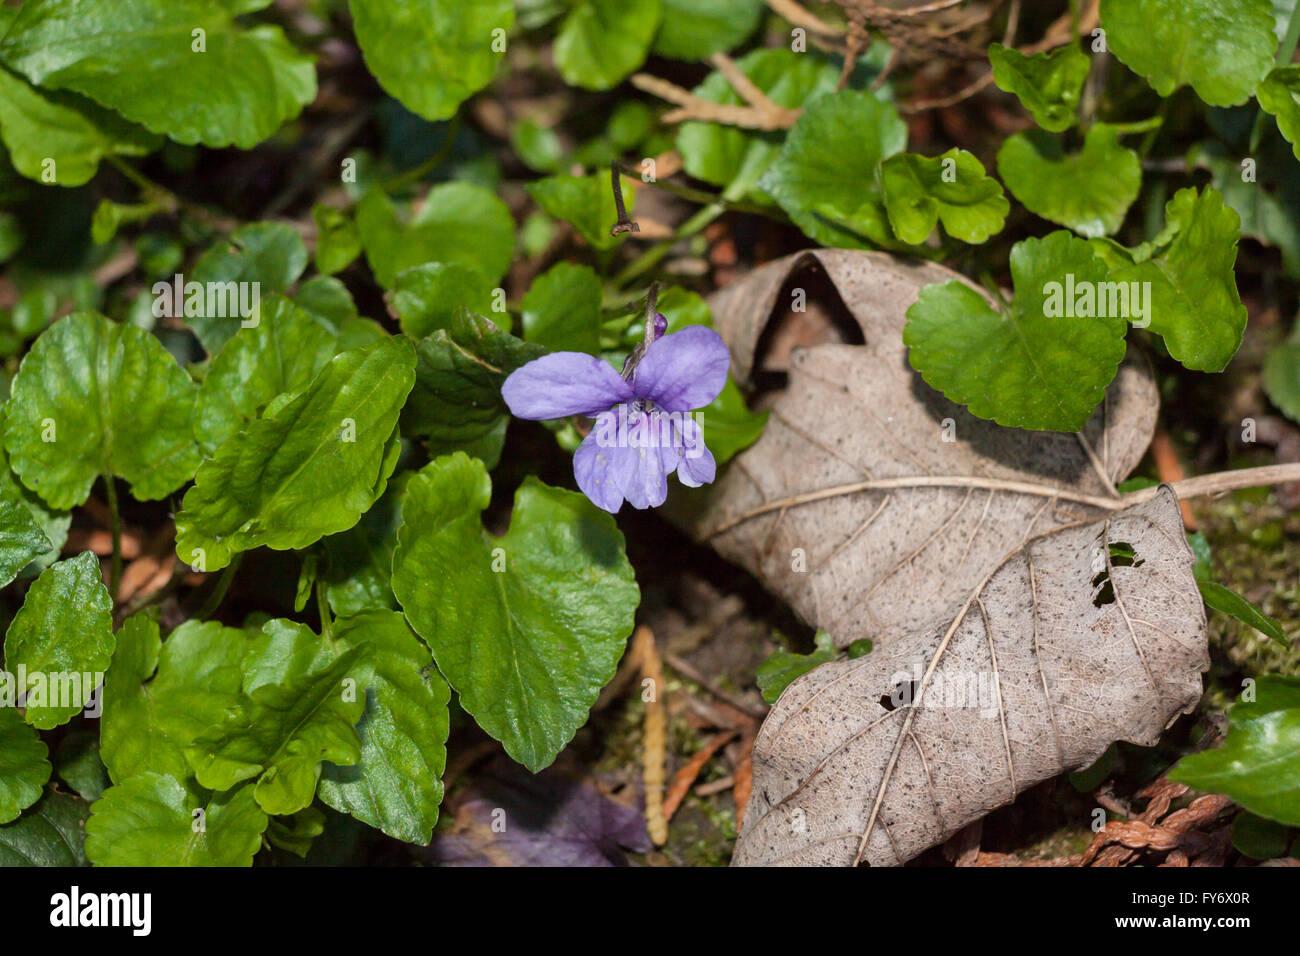 Early dog-violet (Viola reichenbachiana) - Stock Image